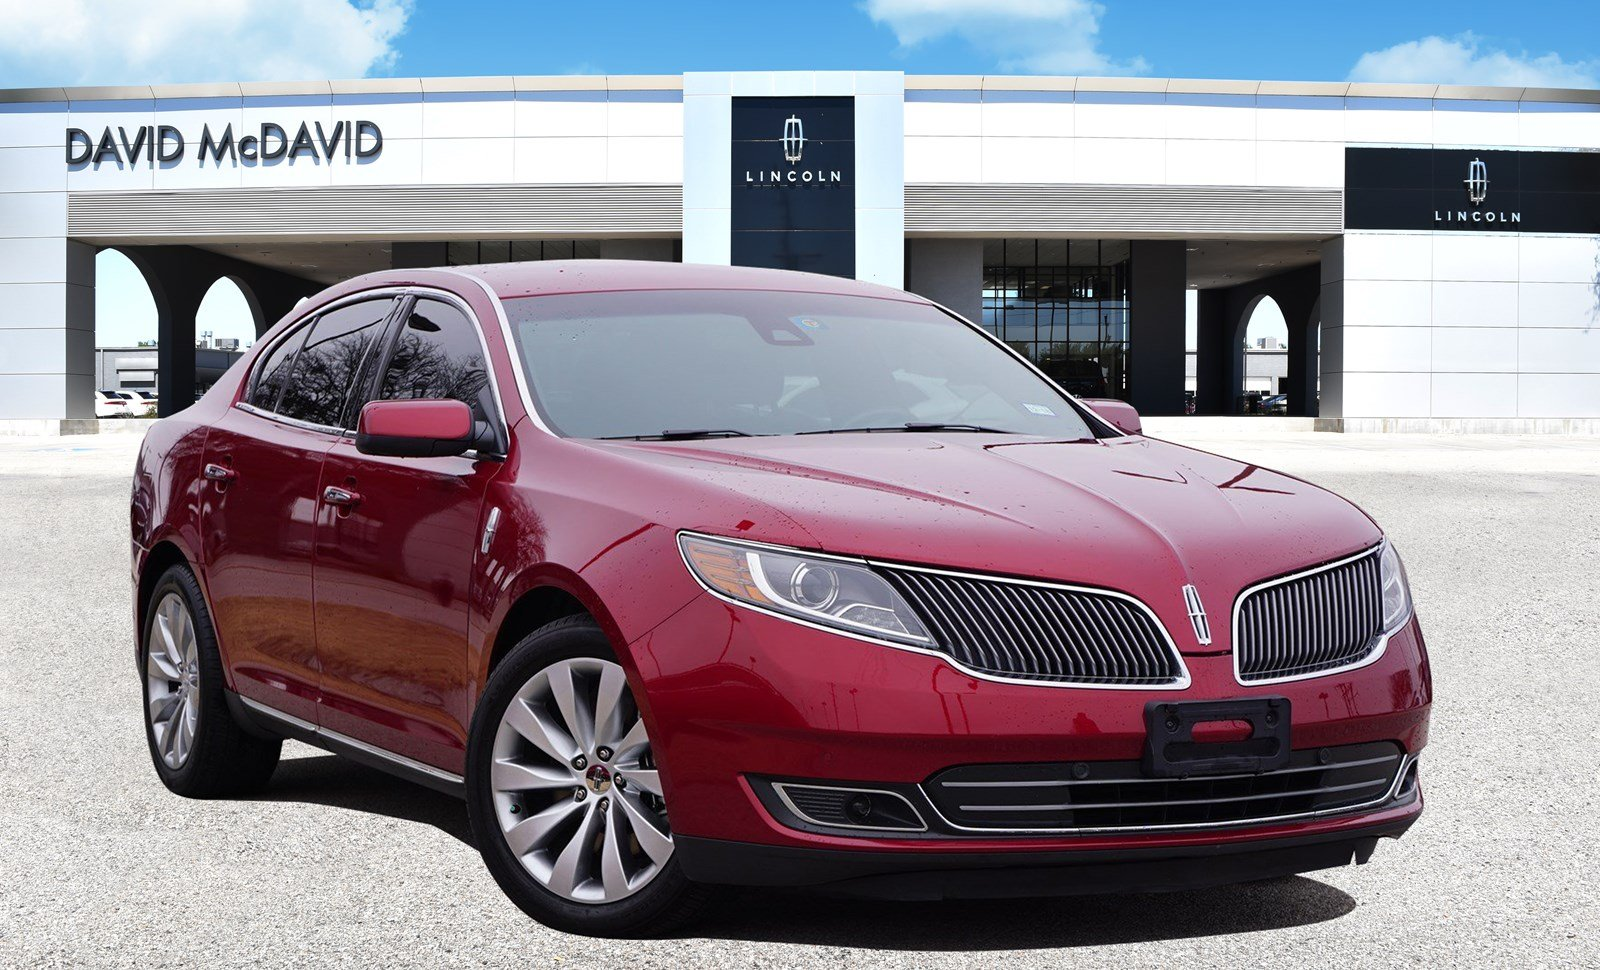 Photo Pre-Owned 2014 Lincoln MKS Sedan 6 in PlanoDallasFort Worth TX